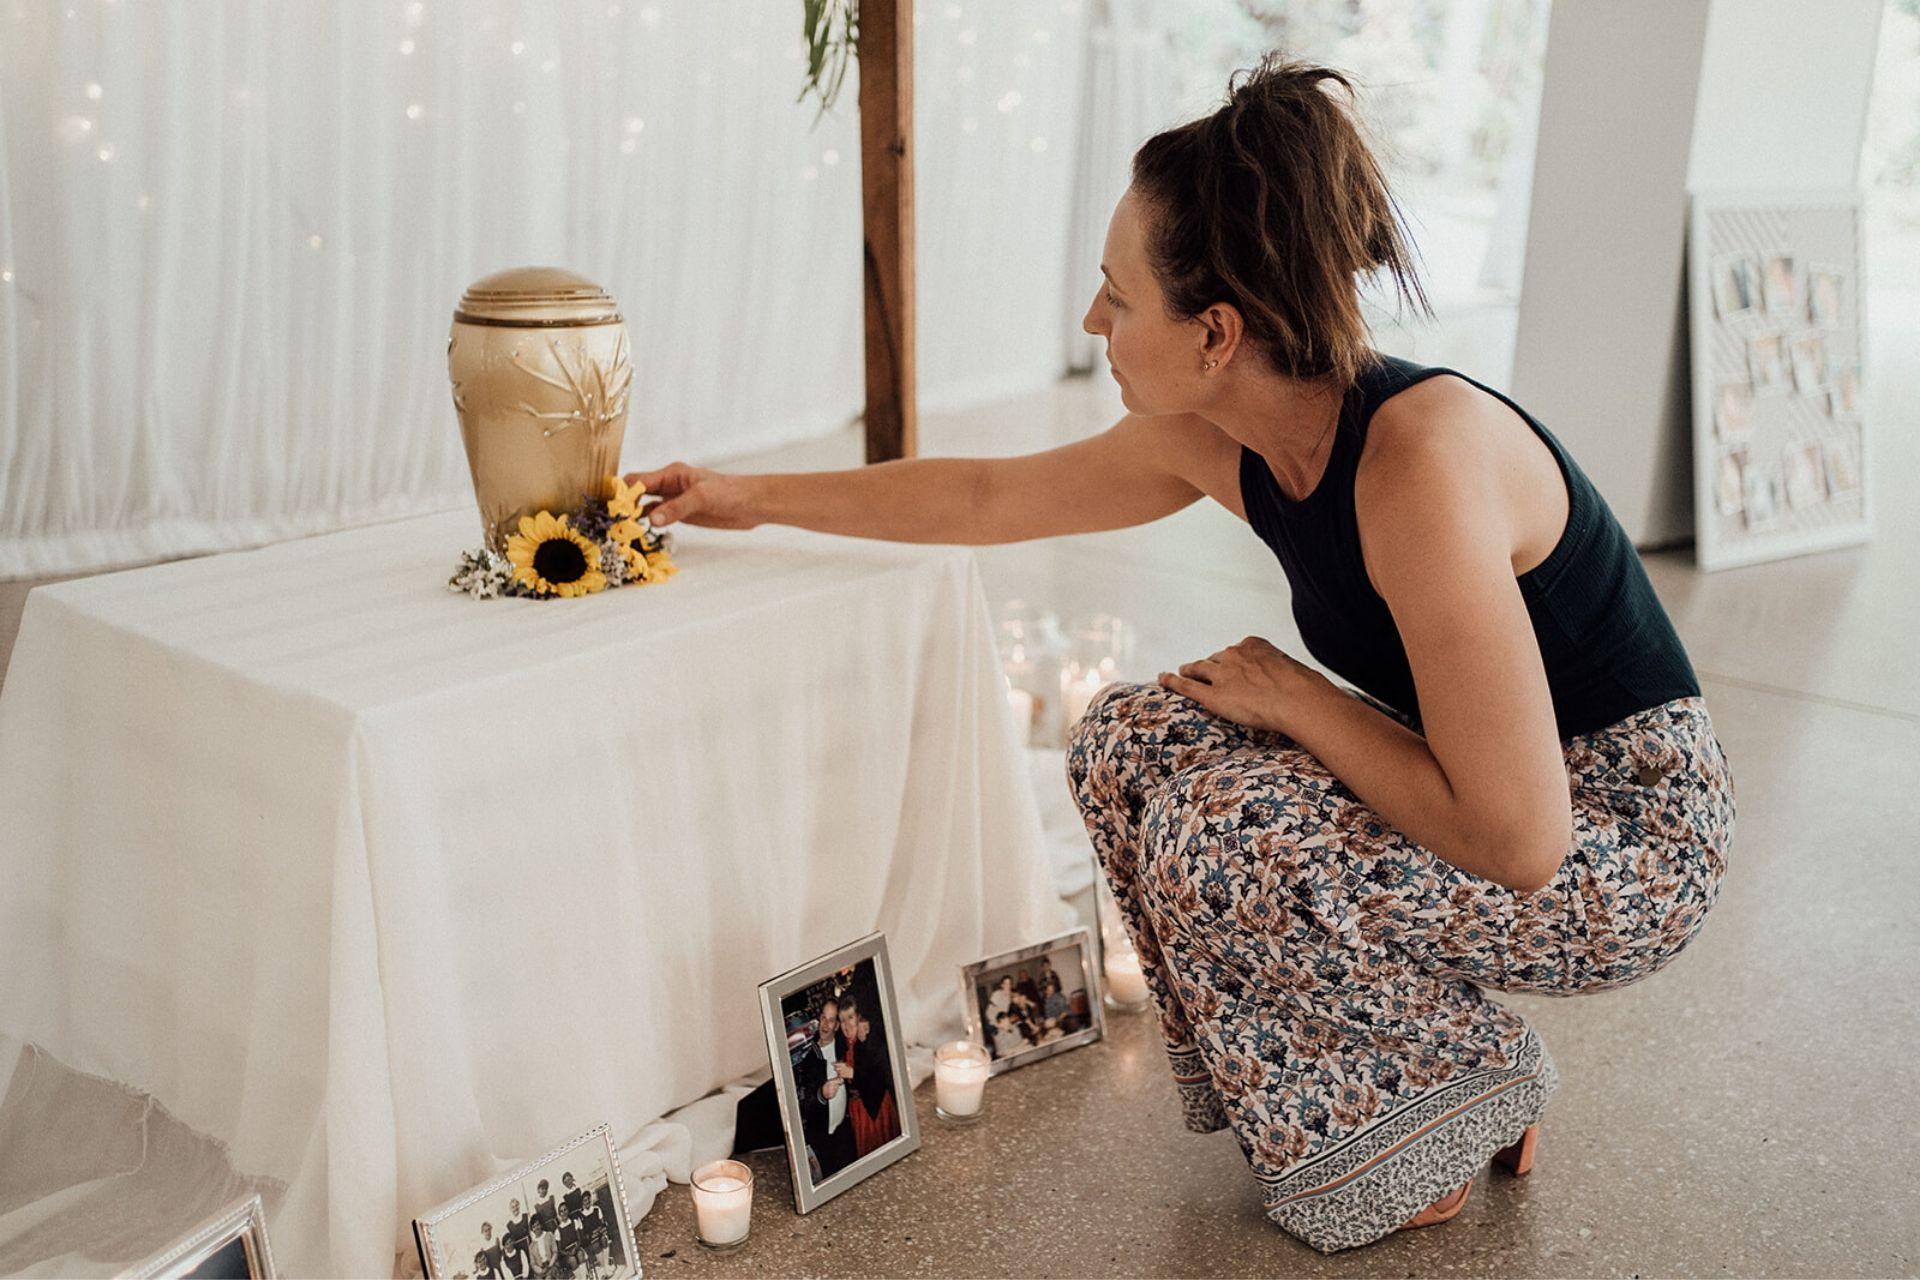 Funeral Celebrant showing tears